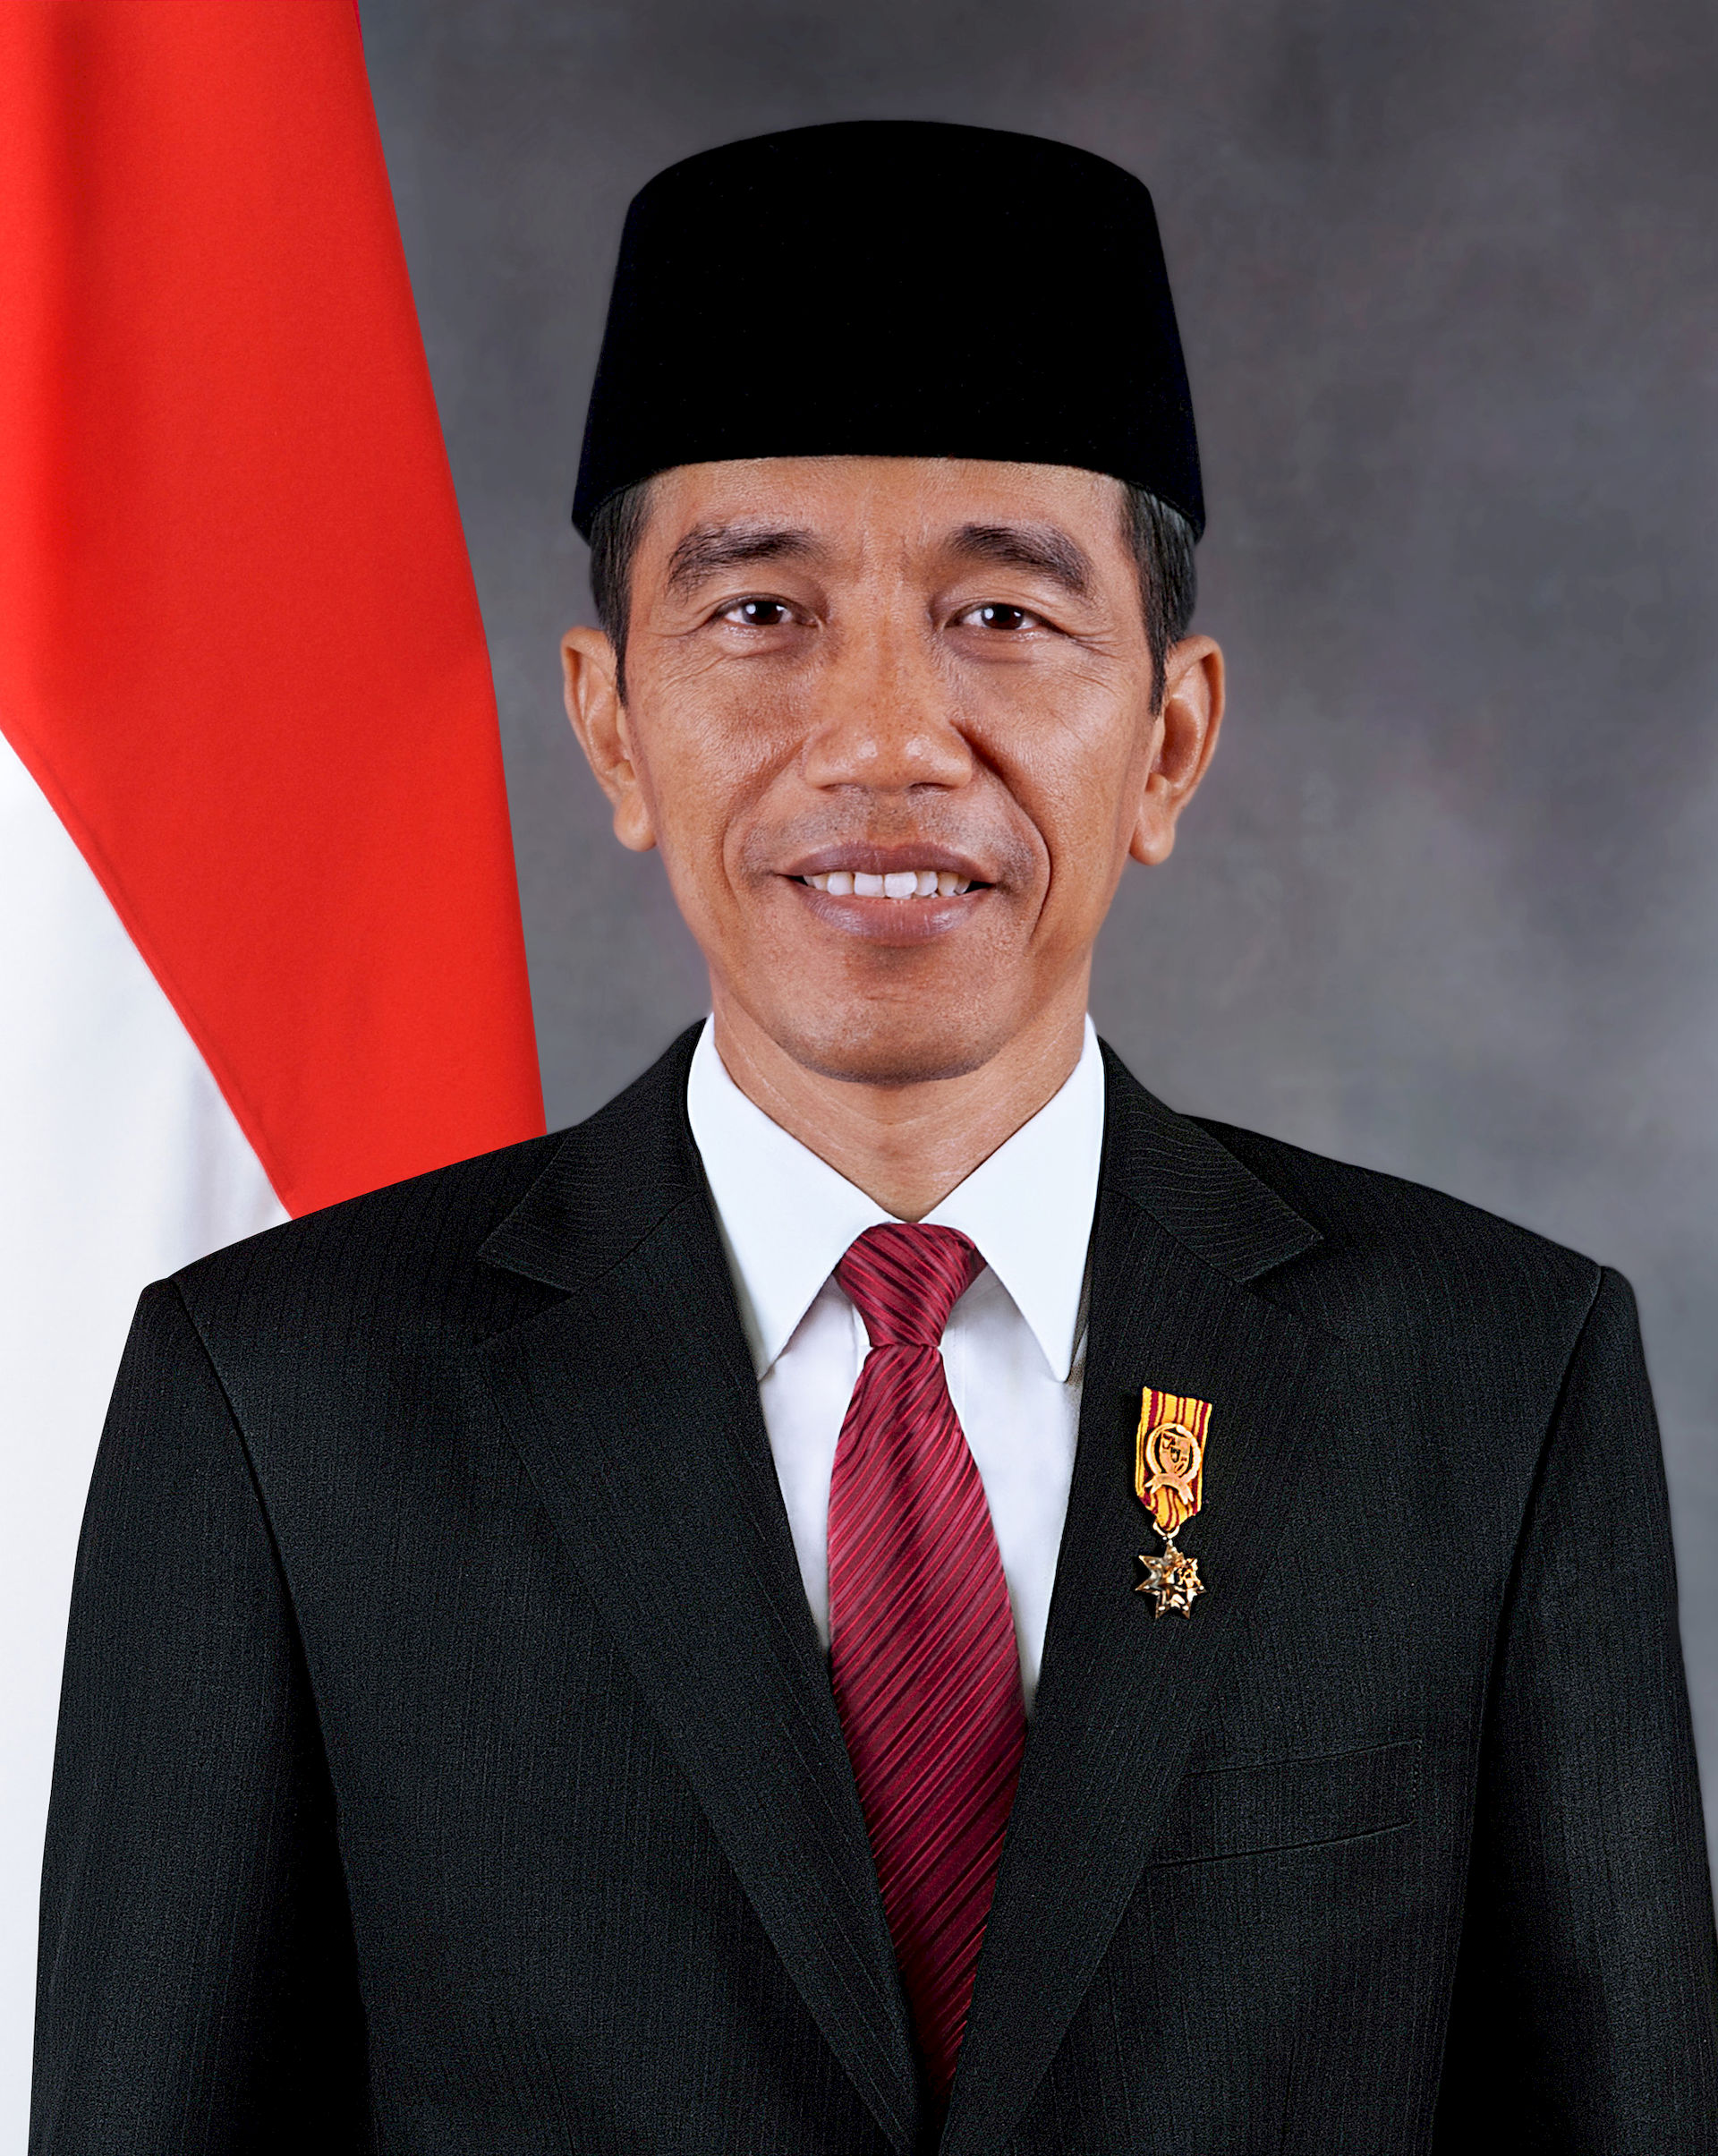 Photo of Joko Widodo: President of Indonesia